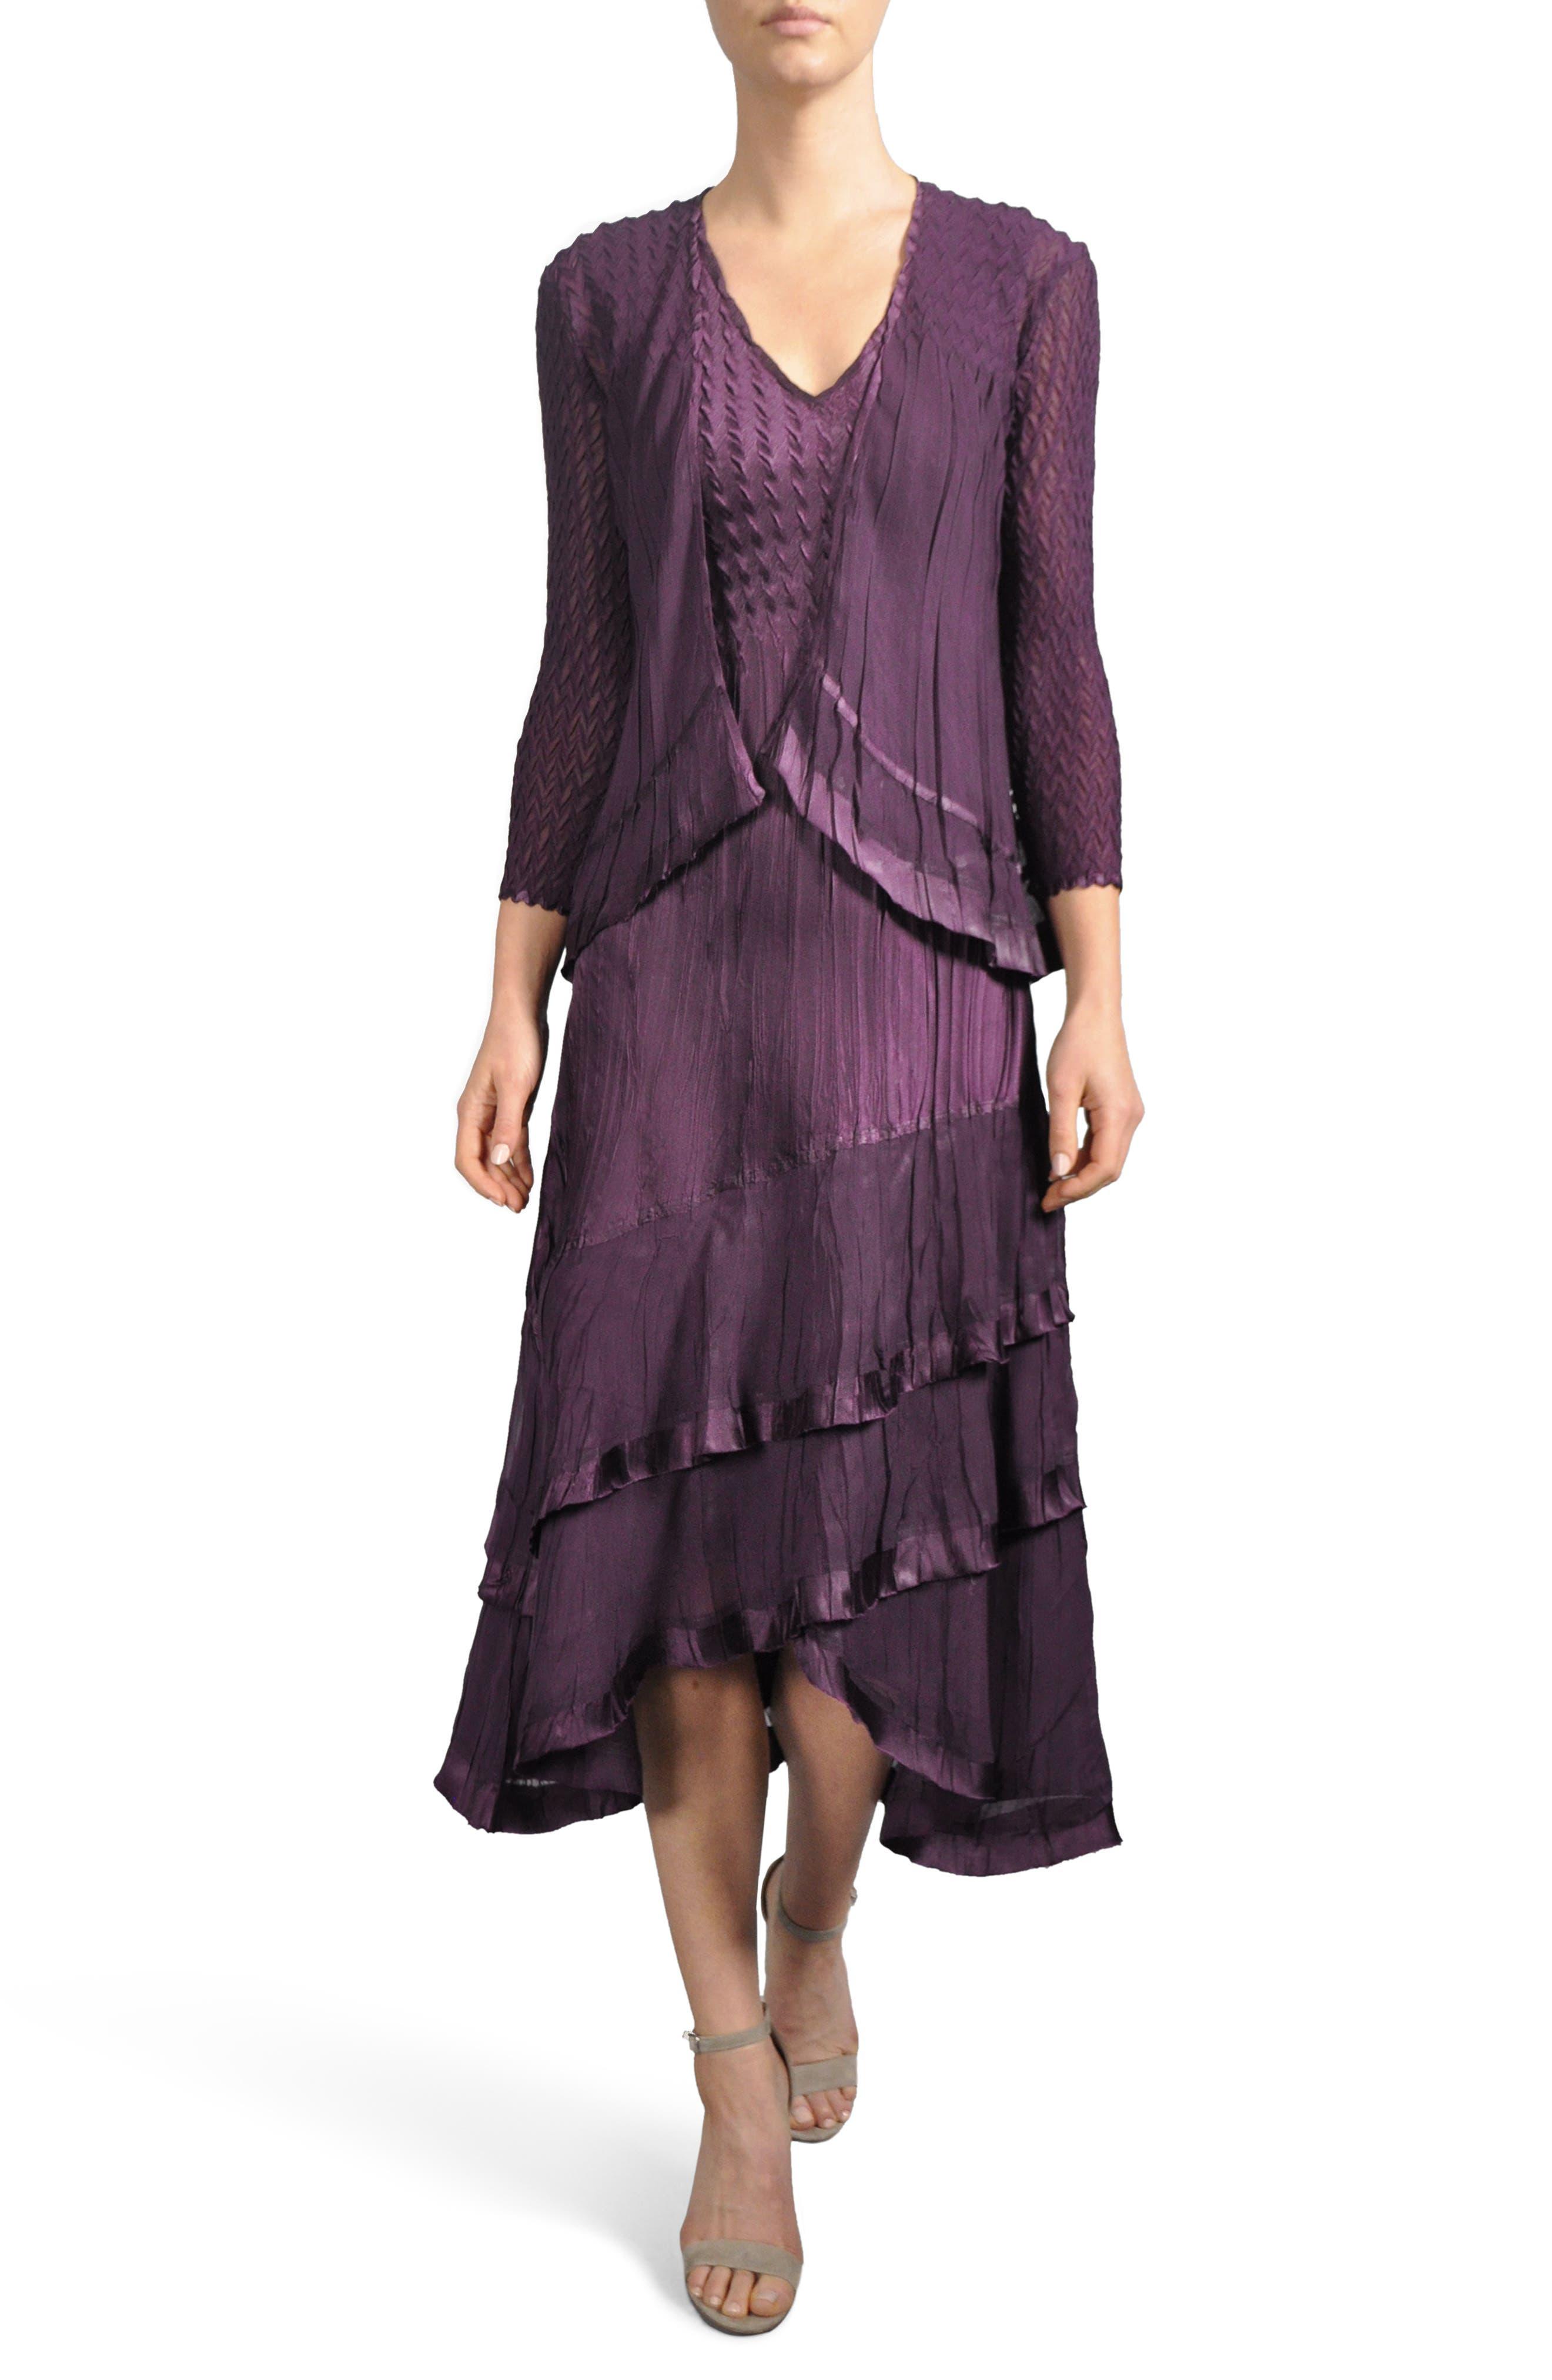 Komorov Textured Tiered Midi Dress with Jacket,                             Main thumbnail 1, color,                             503